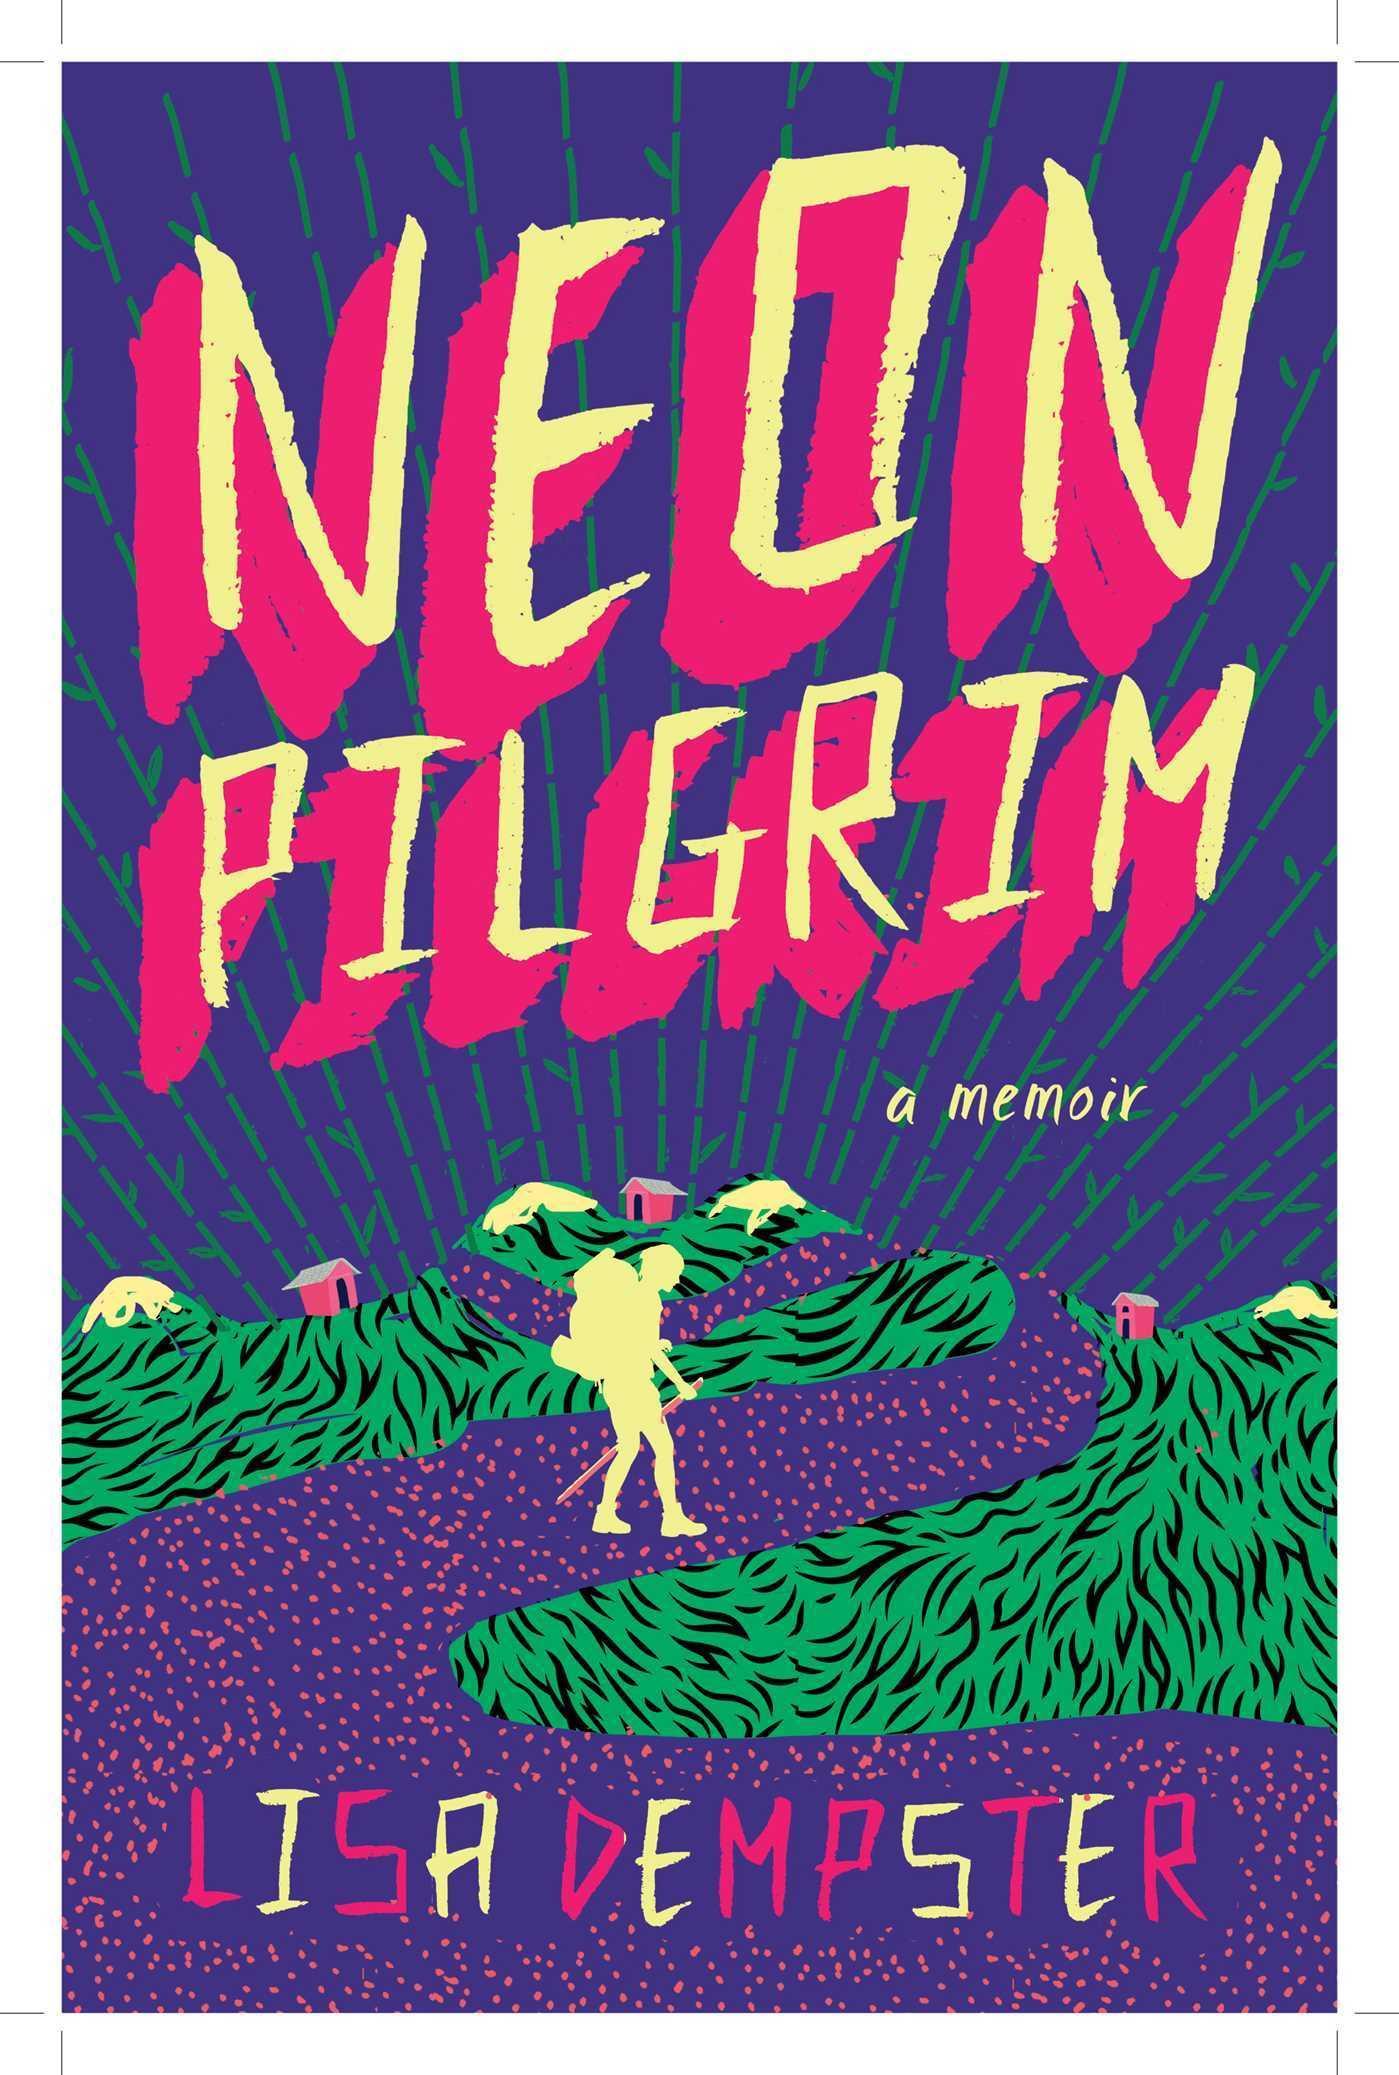 NeonPilgrim